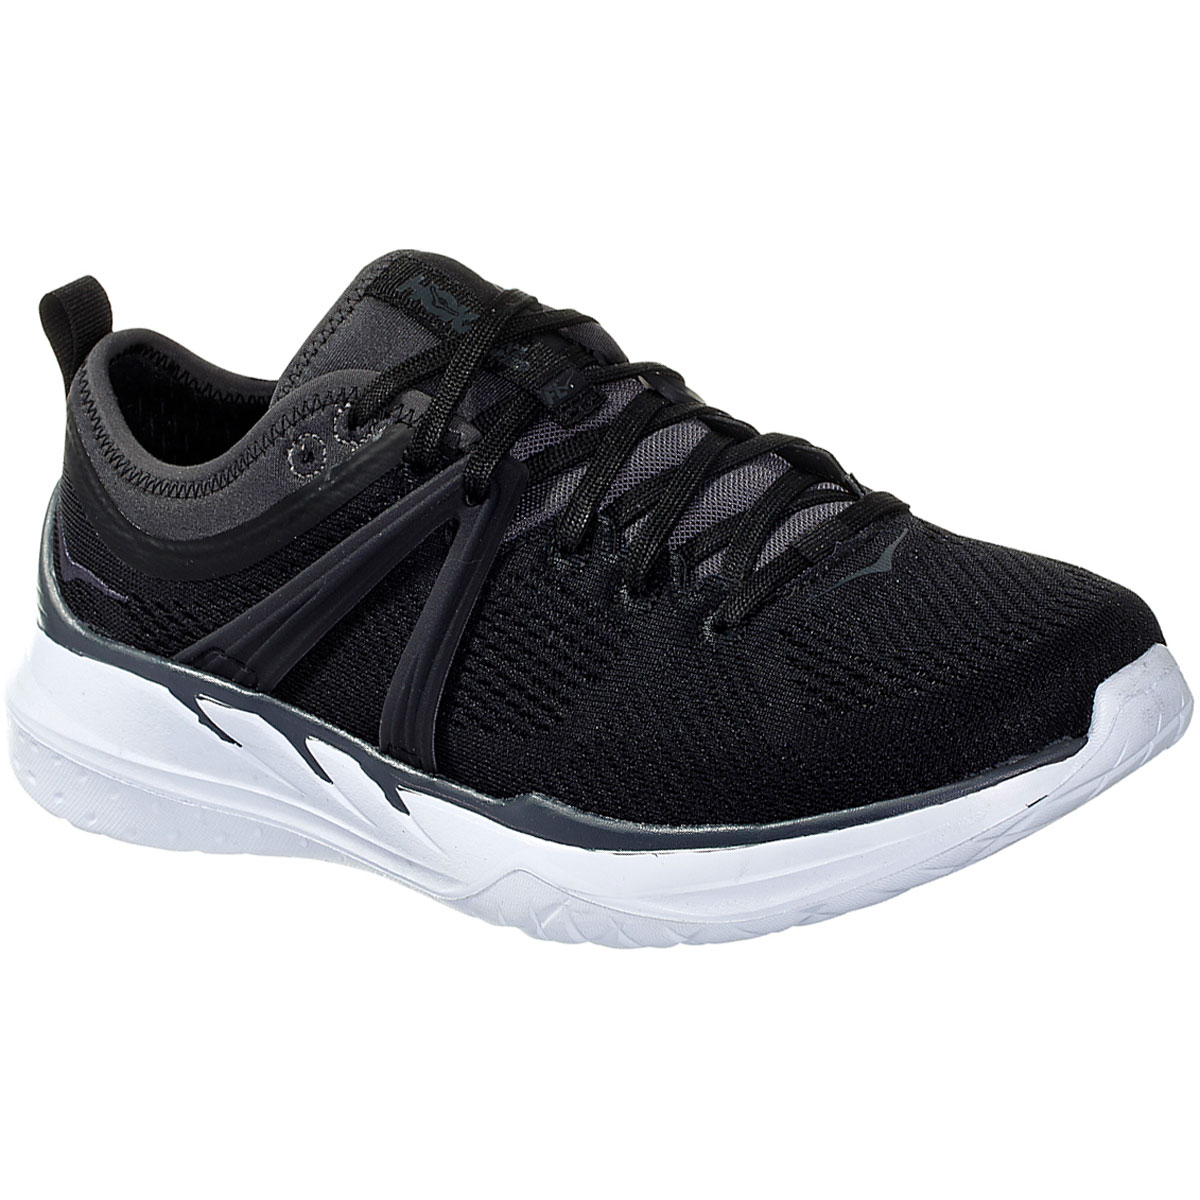 Women's Hoka One One Tivra Running Shoe - Color: Black/Dark Shadow - Size: 5 - Width: Regular, Black/Dark Shadow, large, image 2